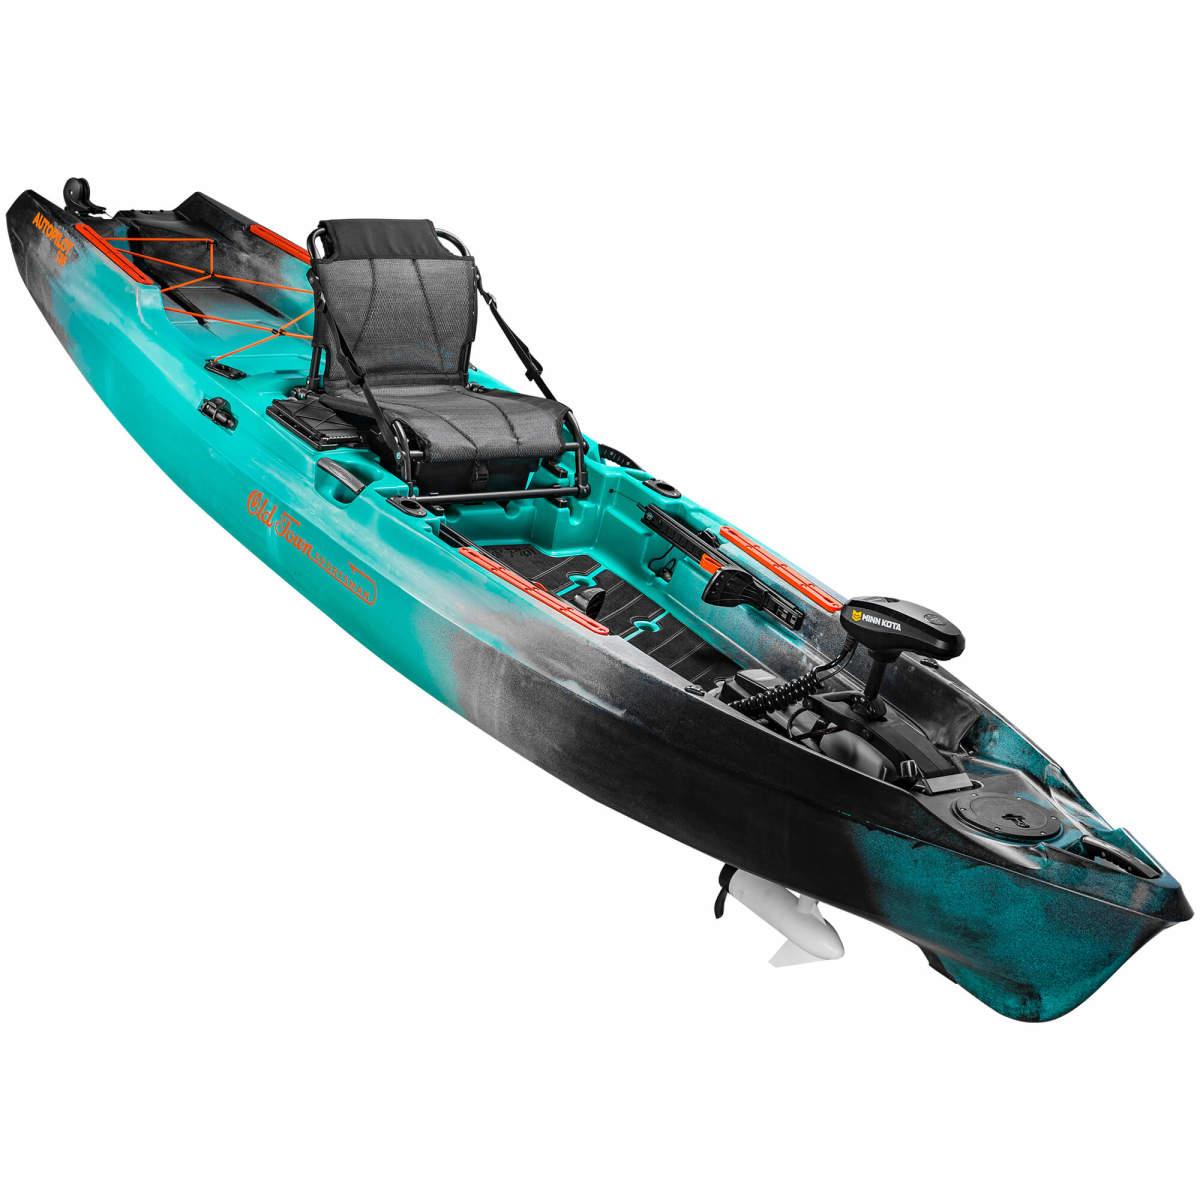 Overall winner, the Old Town Sportsman AutoPilot kayak utilizes Minn Kota's Spot-Lock technology.